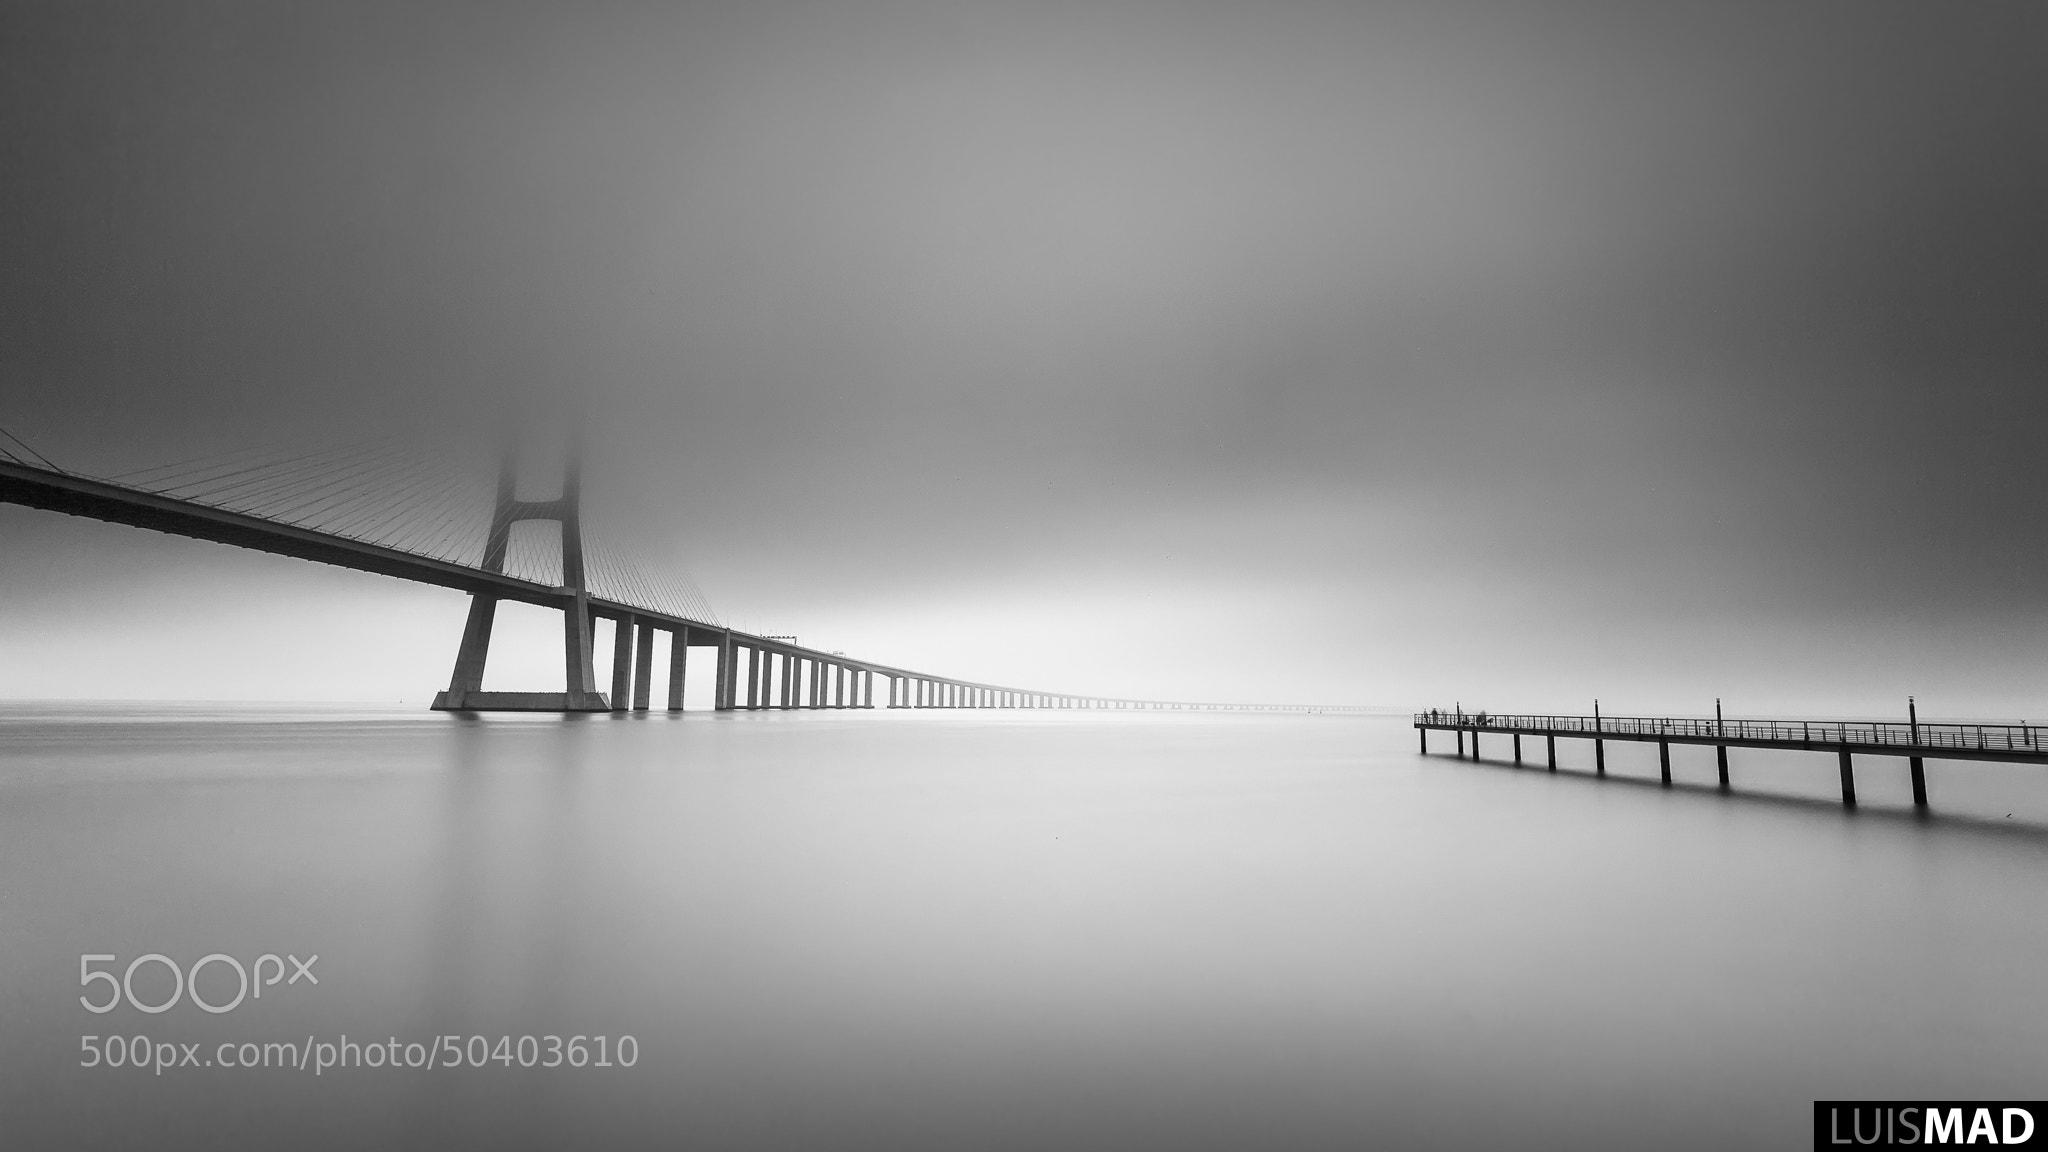 Photograph Foggy Day @ Vasco da Gama Bridge by luismad  on 500px